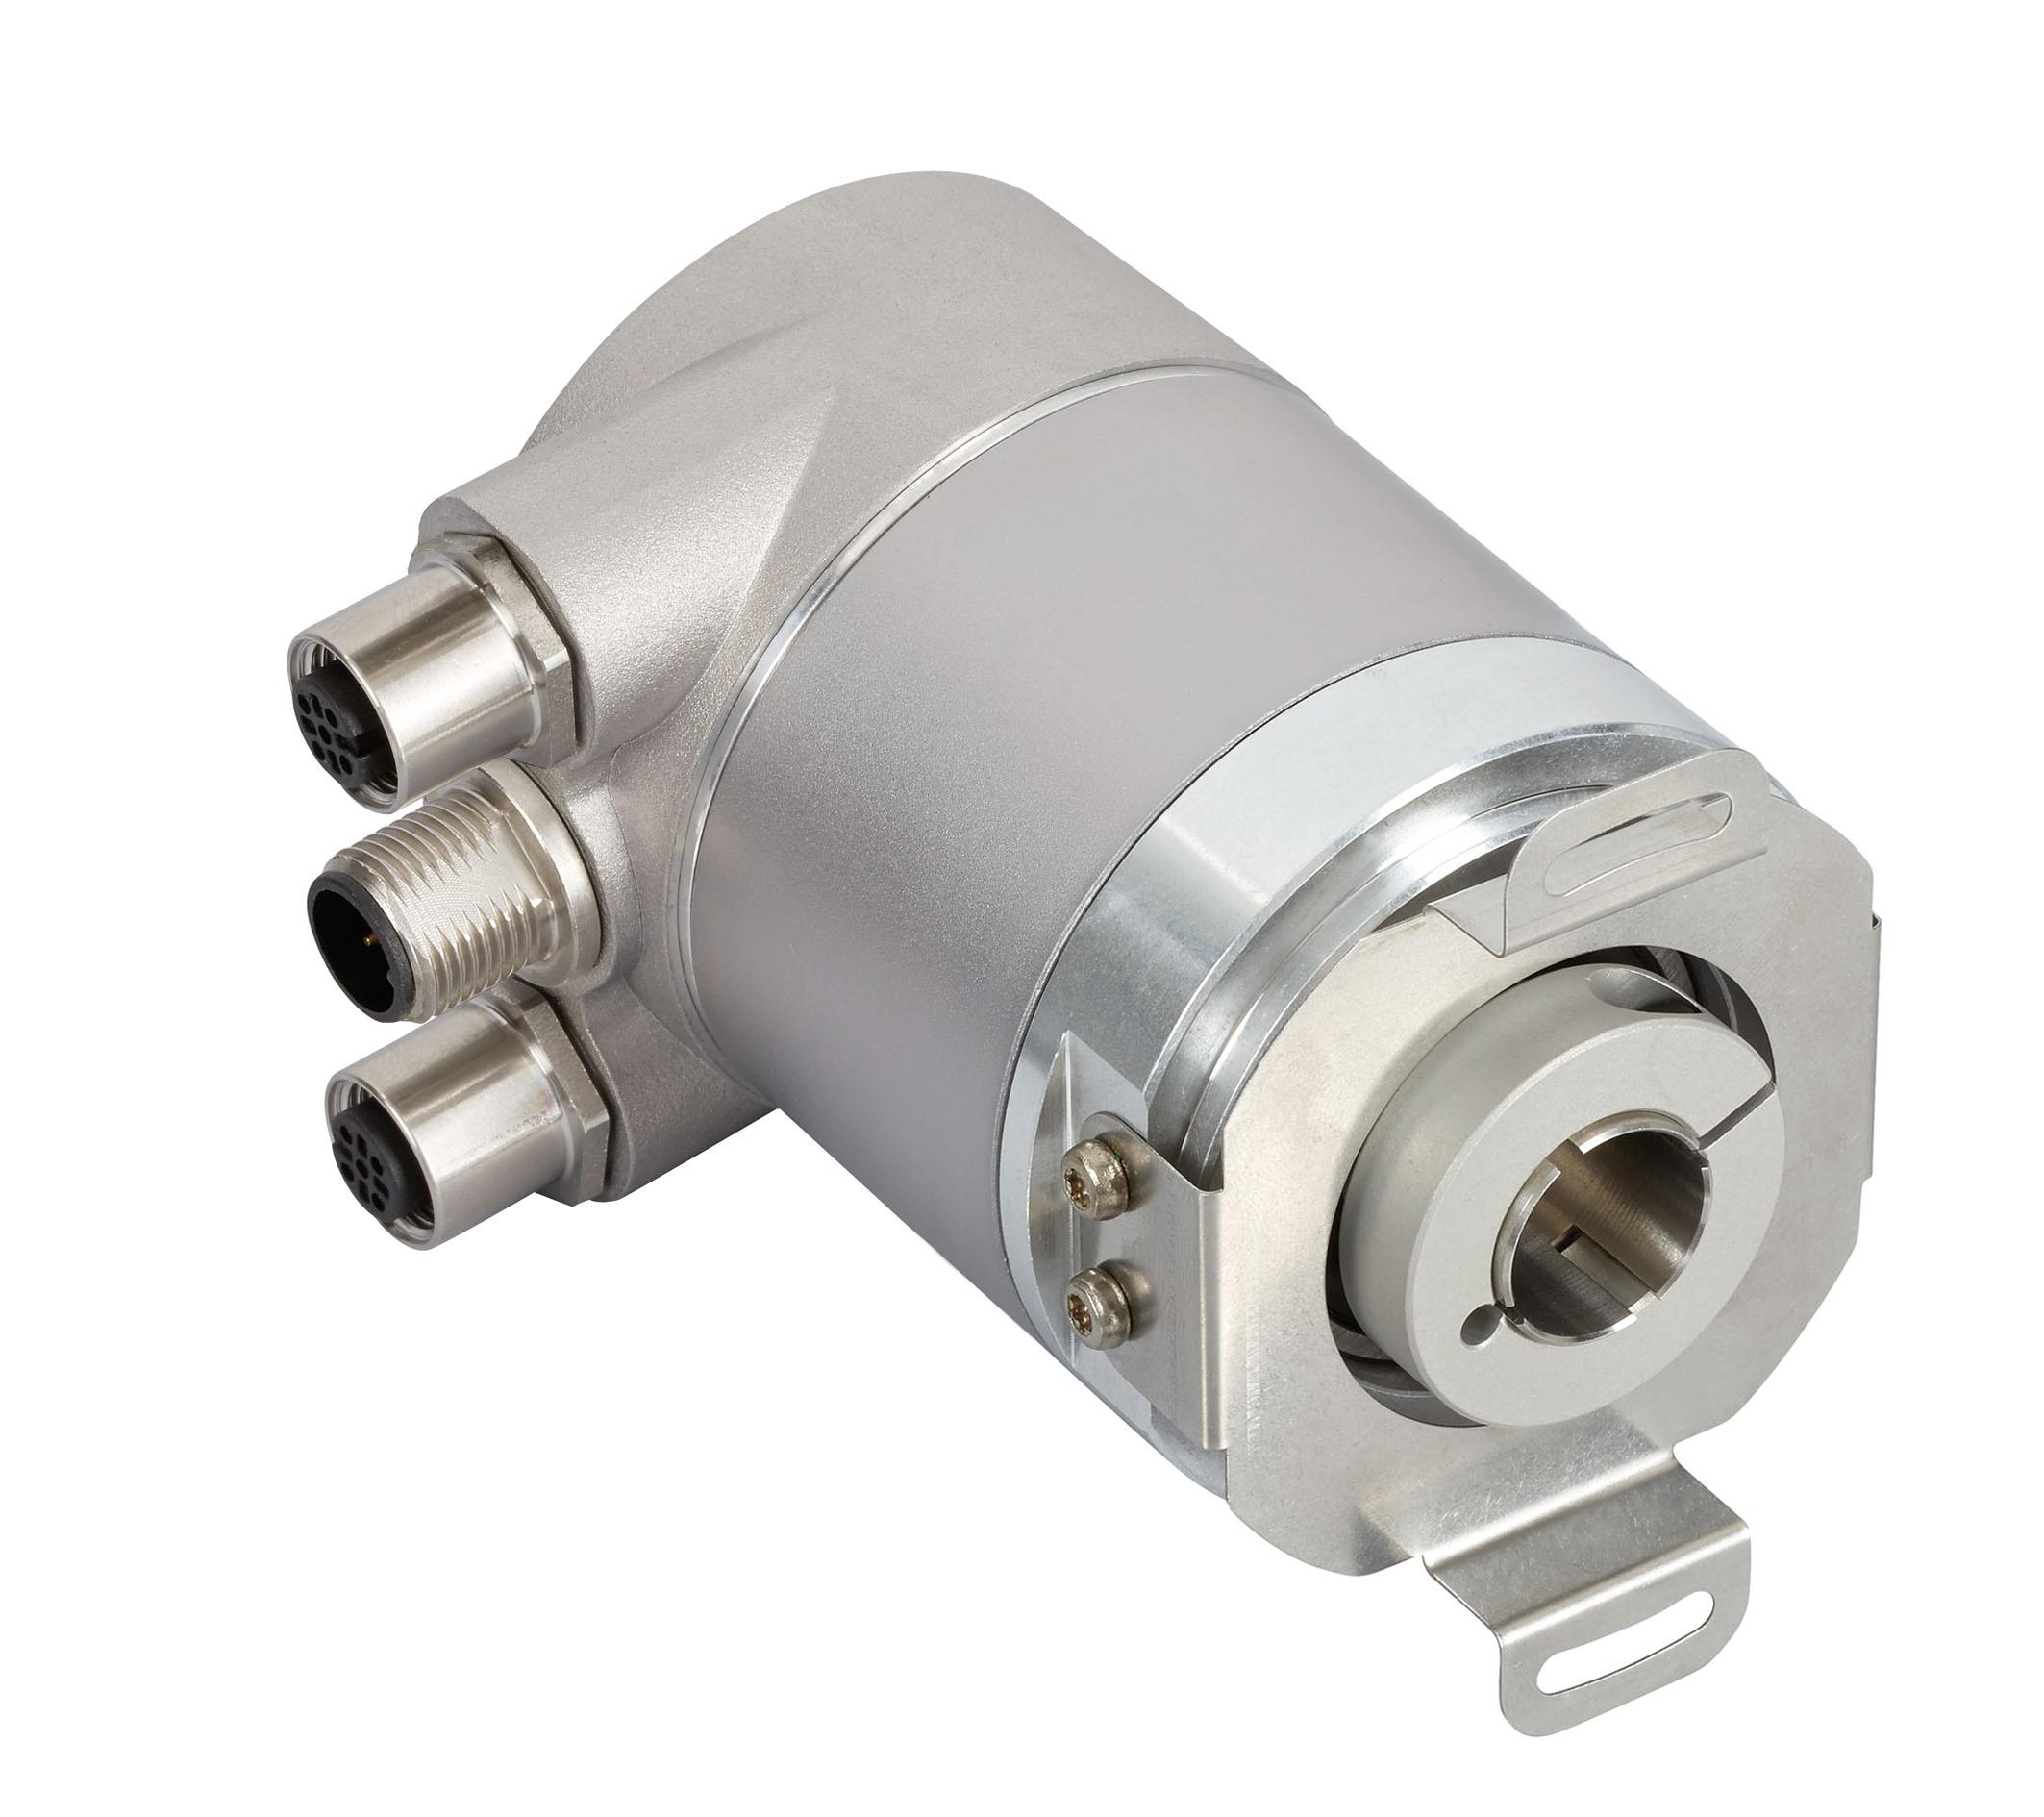 Posital UCD-EC00B-1416-HFS0-PRM